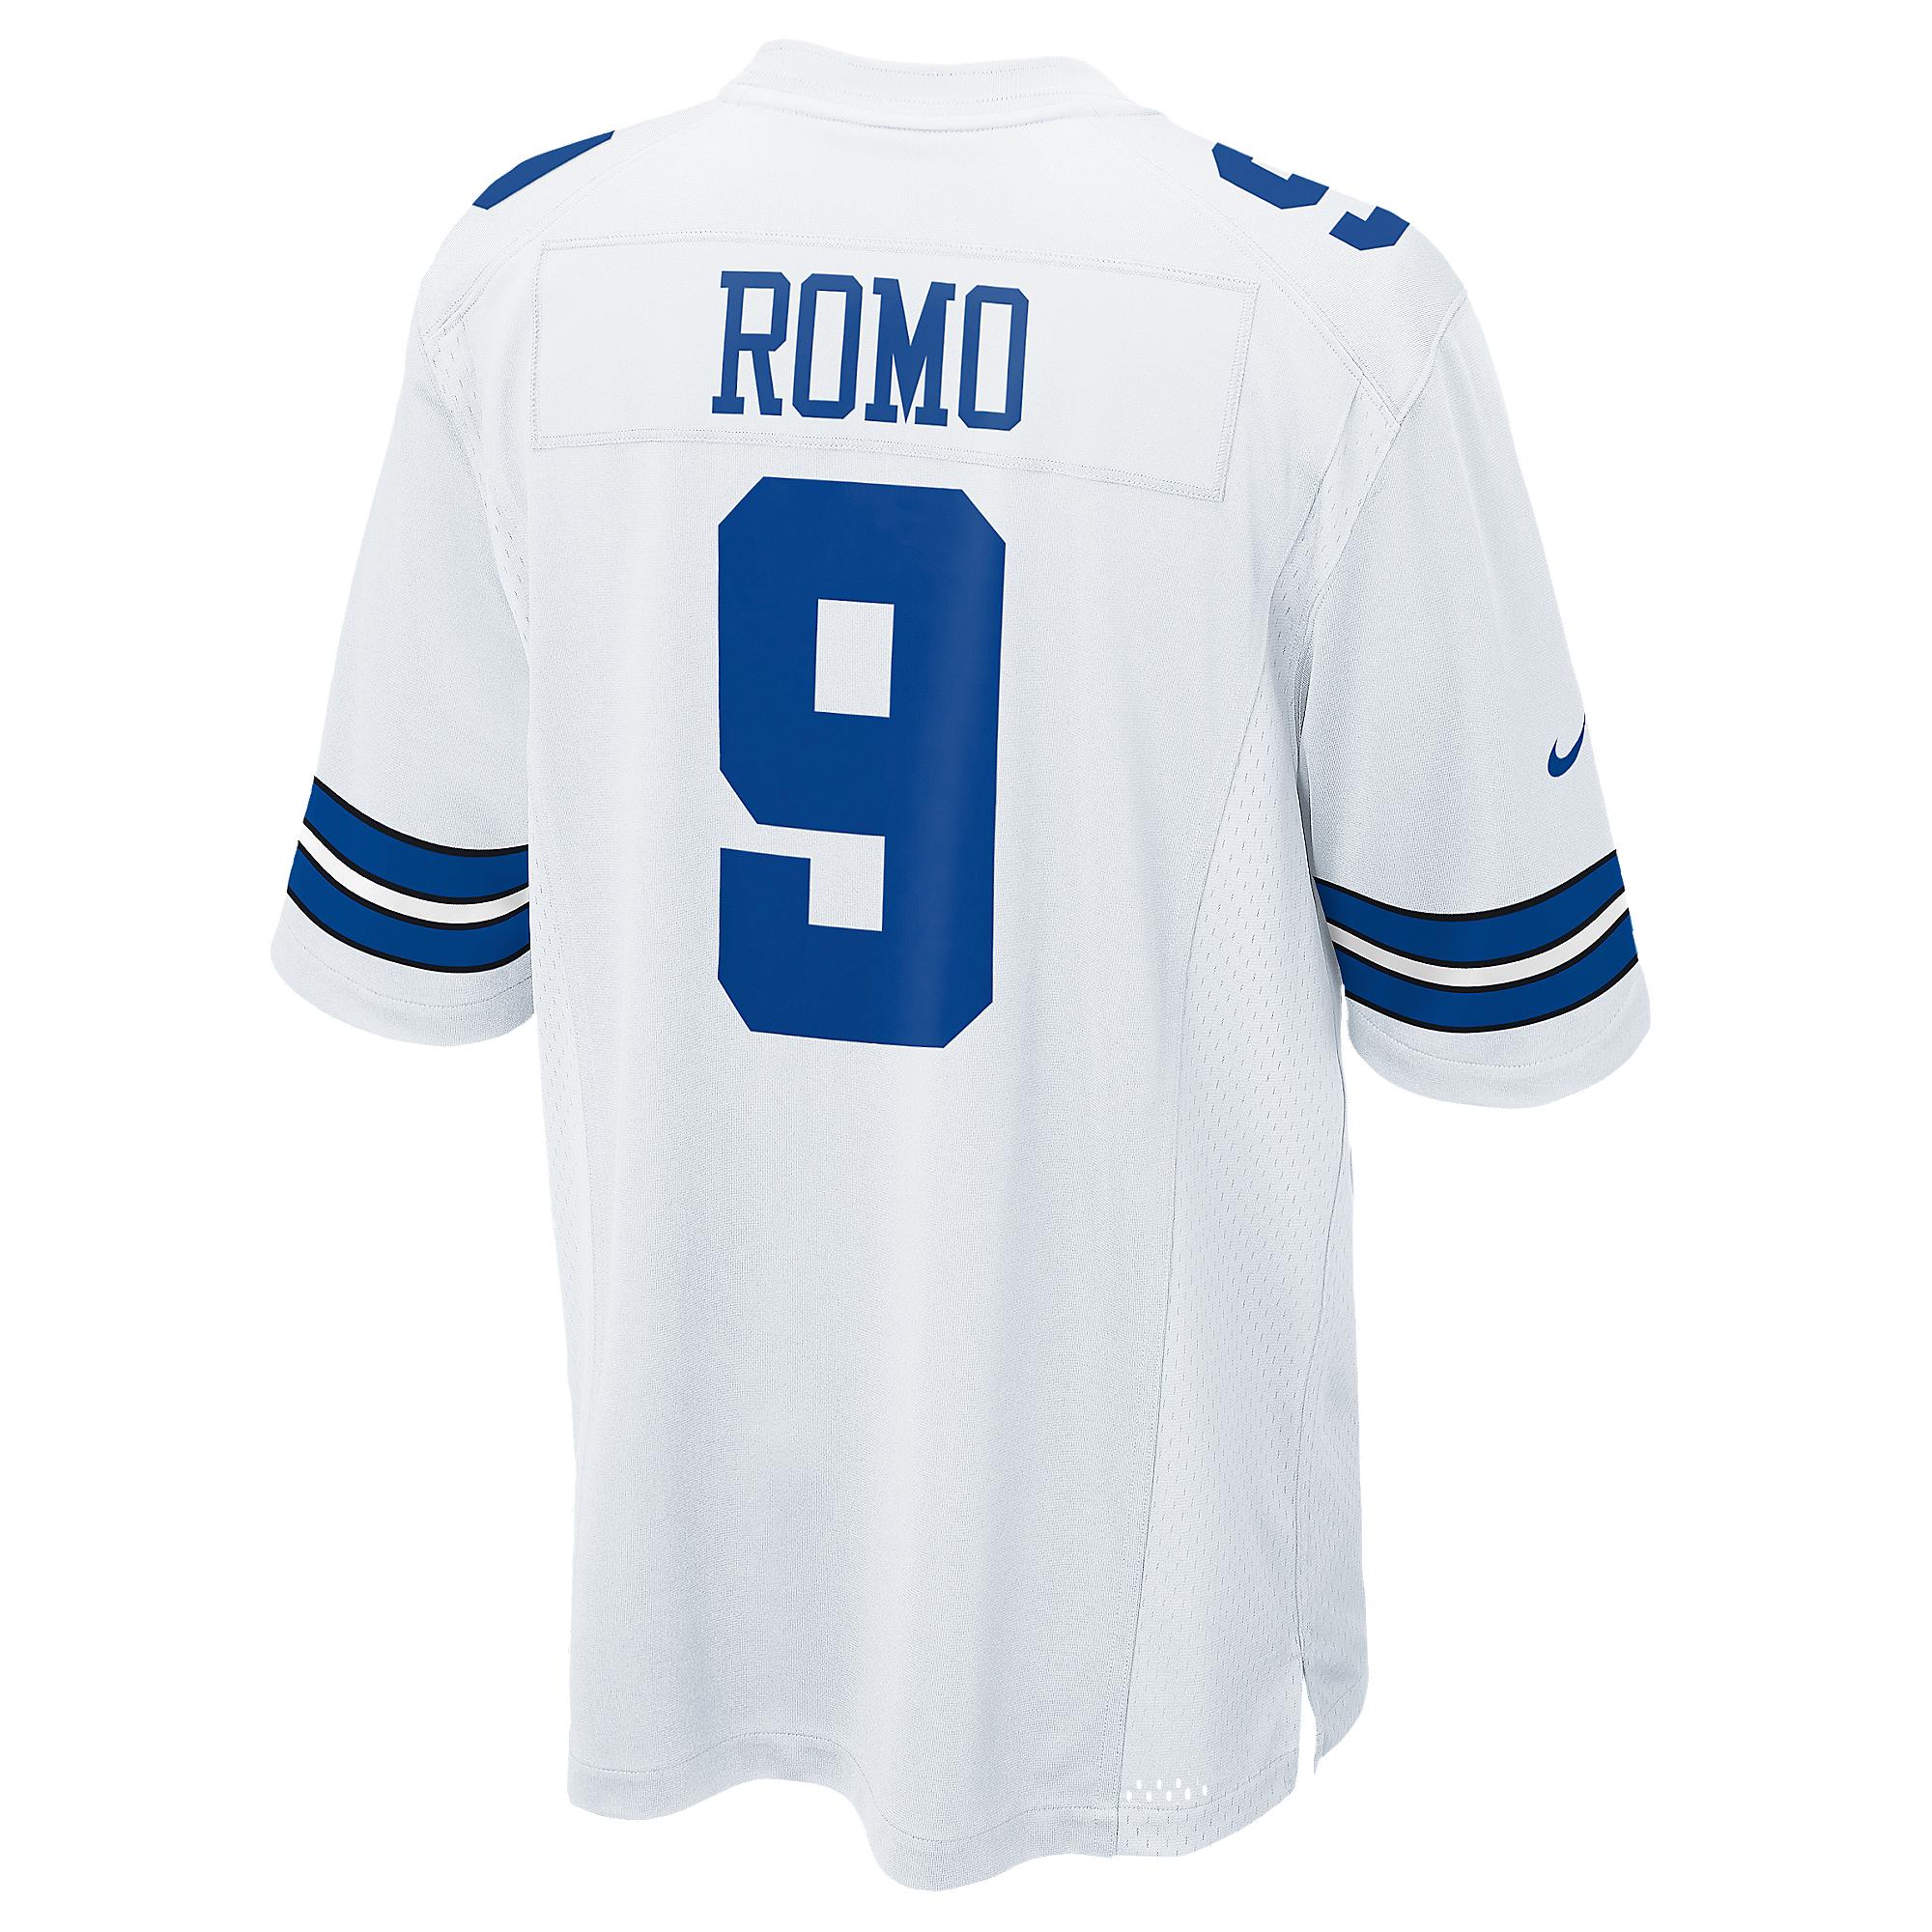 Dallas Cowboys Tony Romo #9 Nike White Game Replica Jersey